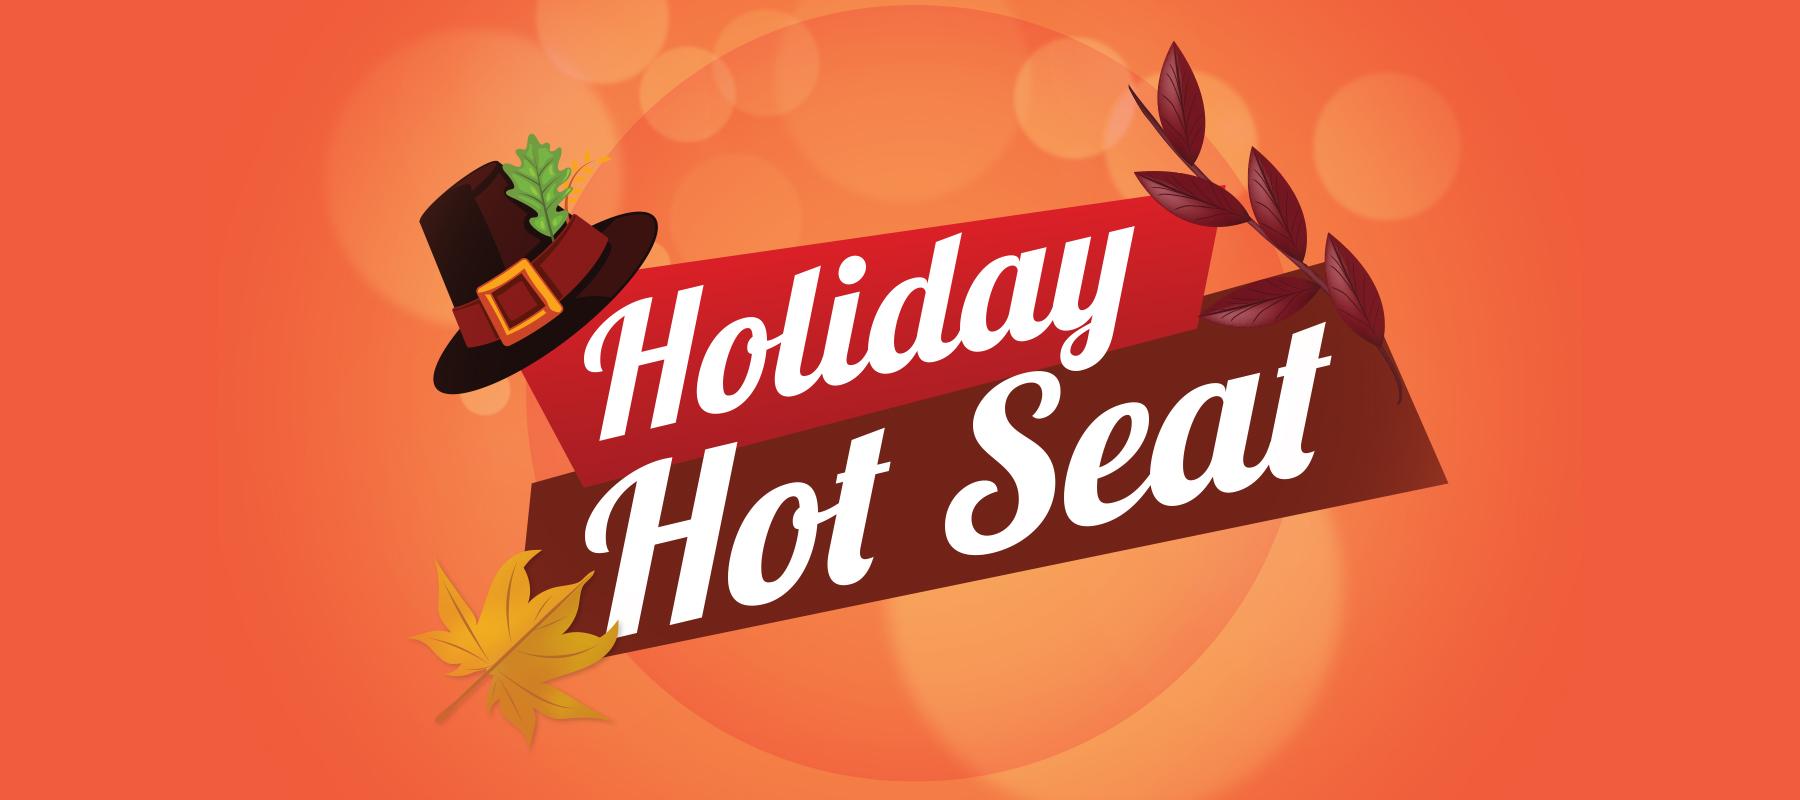 Holiday Hot Seat